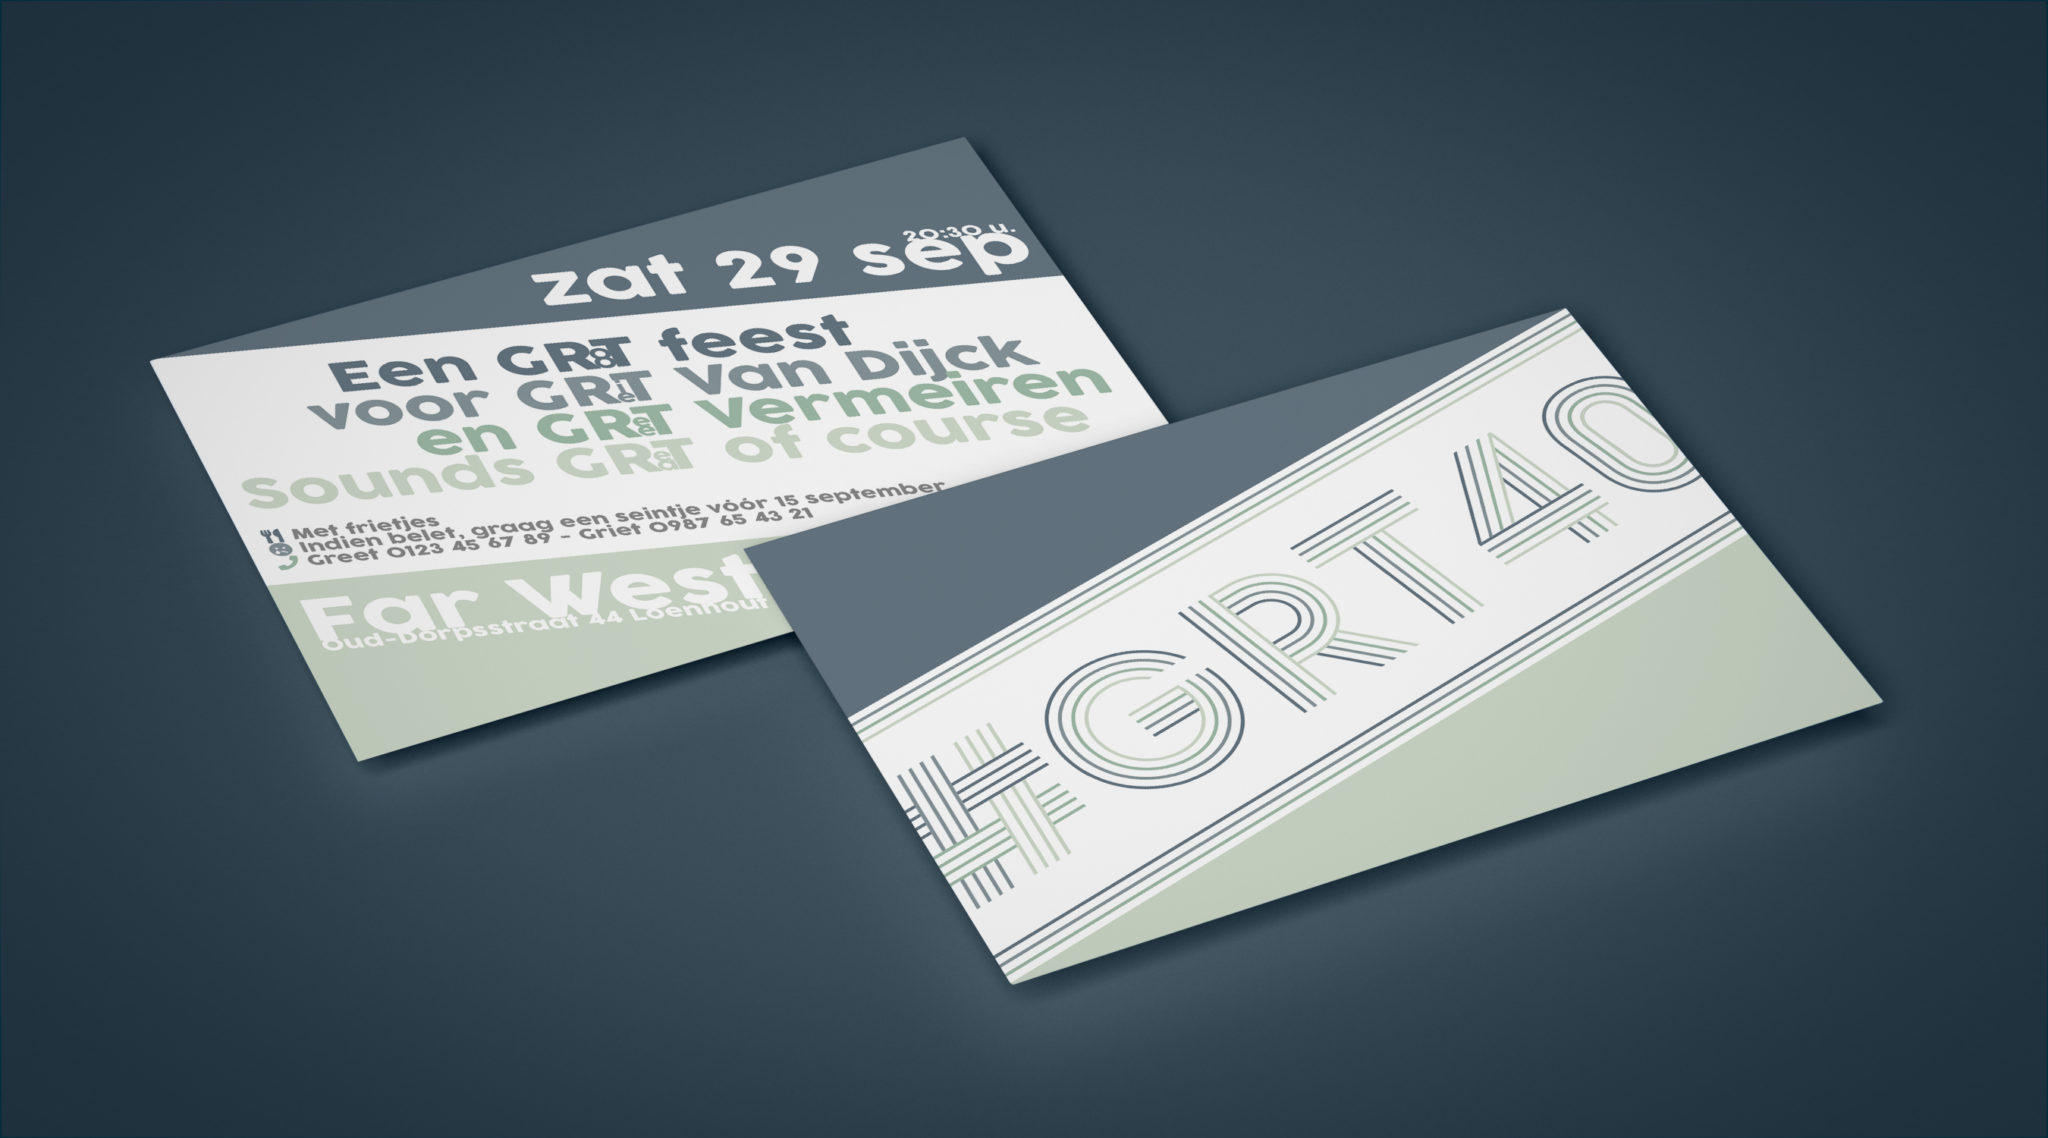 Uitnodiging Greet & Griet 40